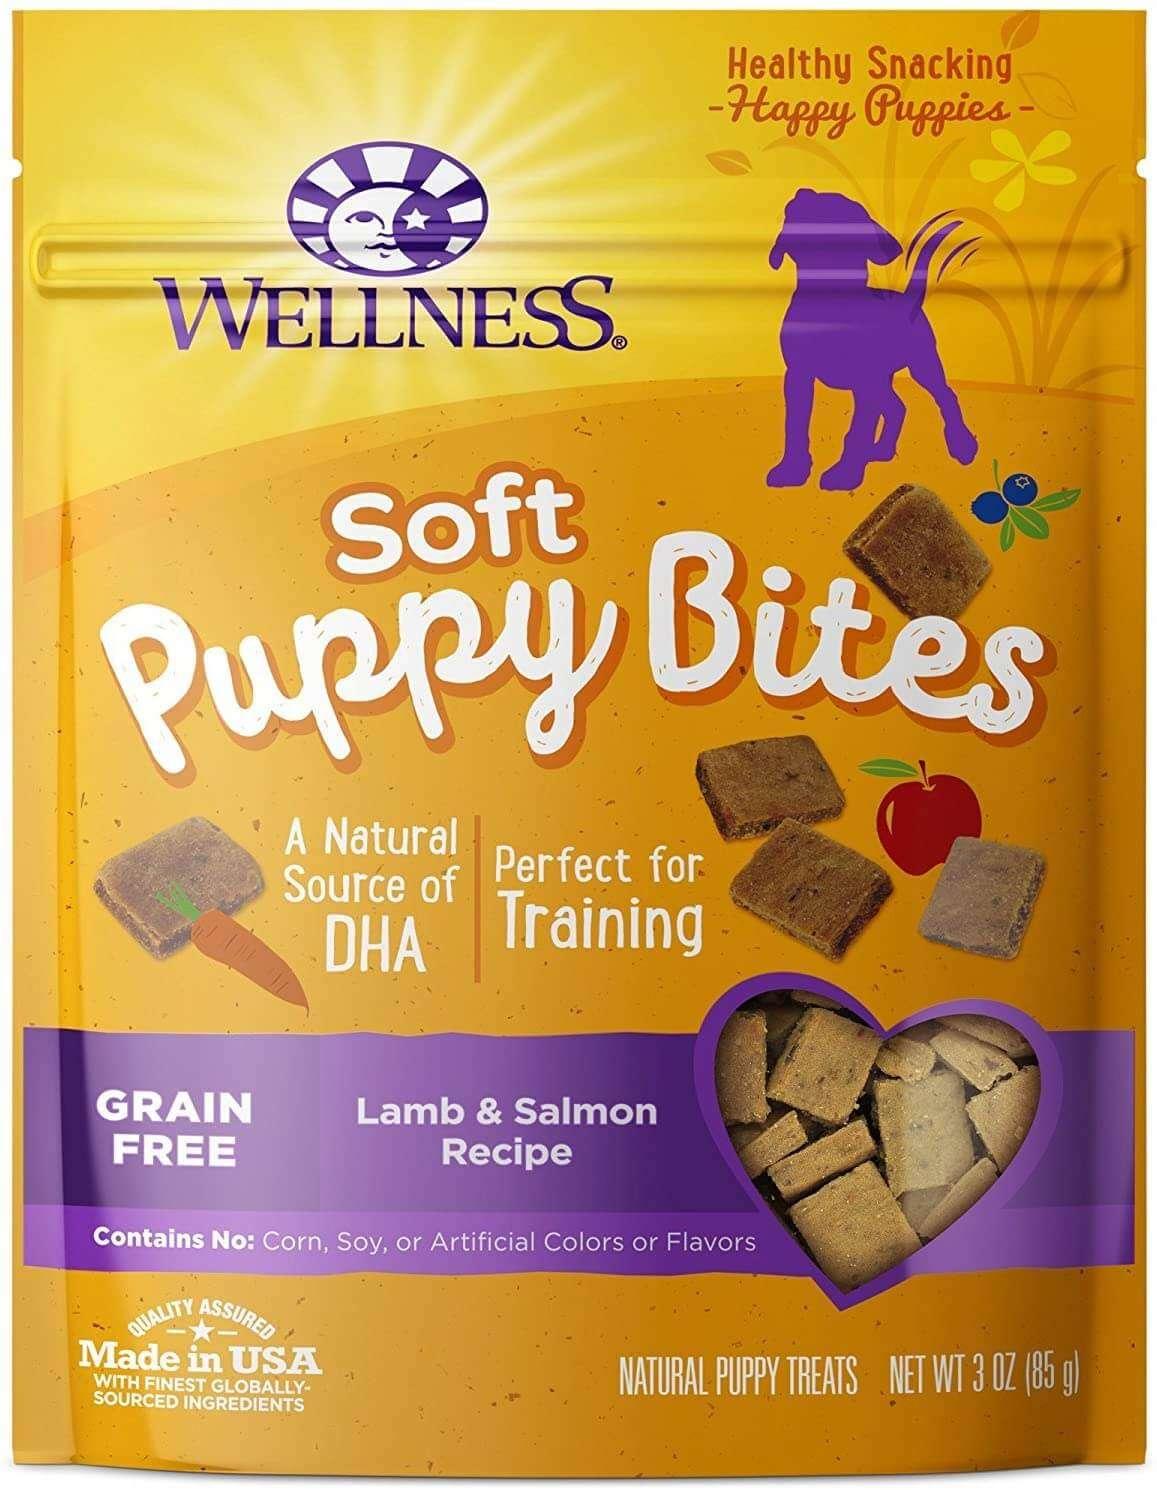 soft dog training treats by Wellness